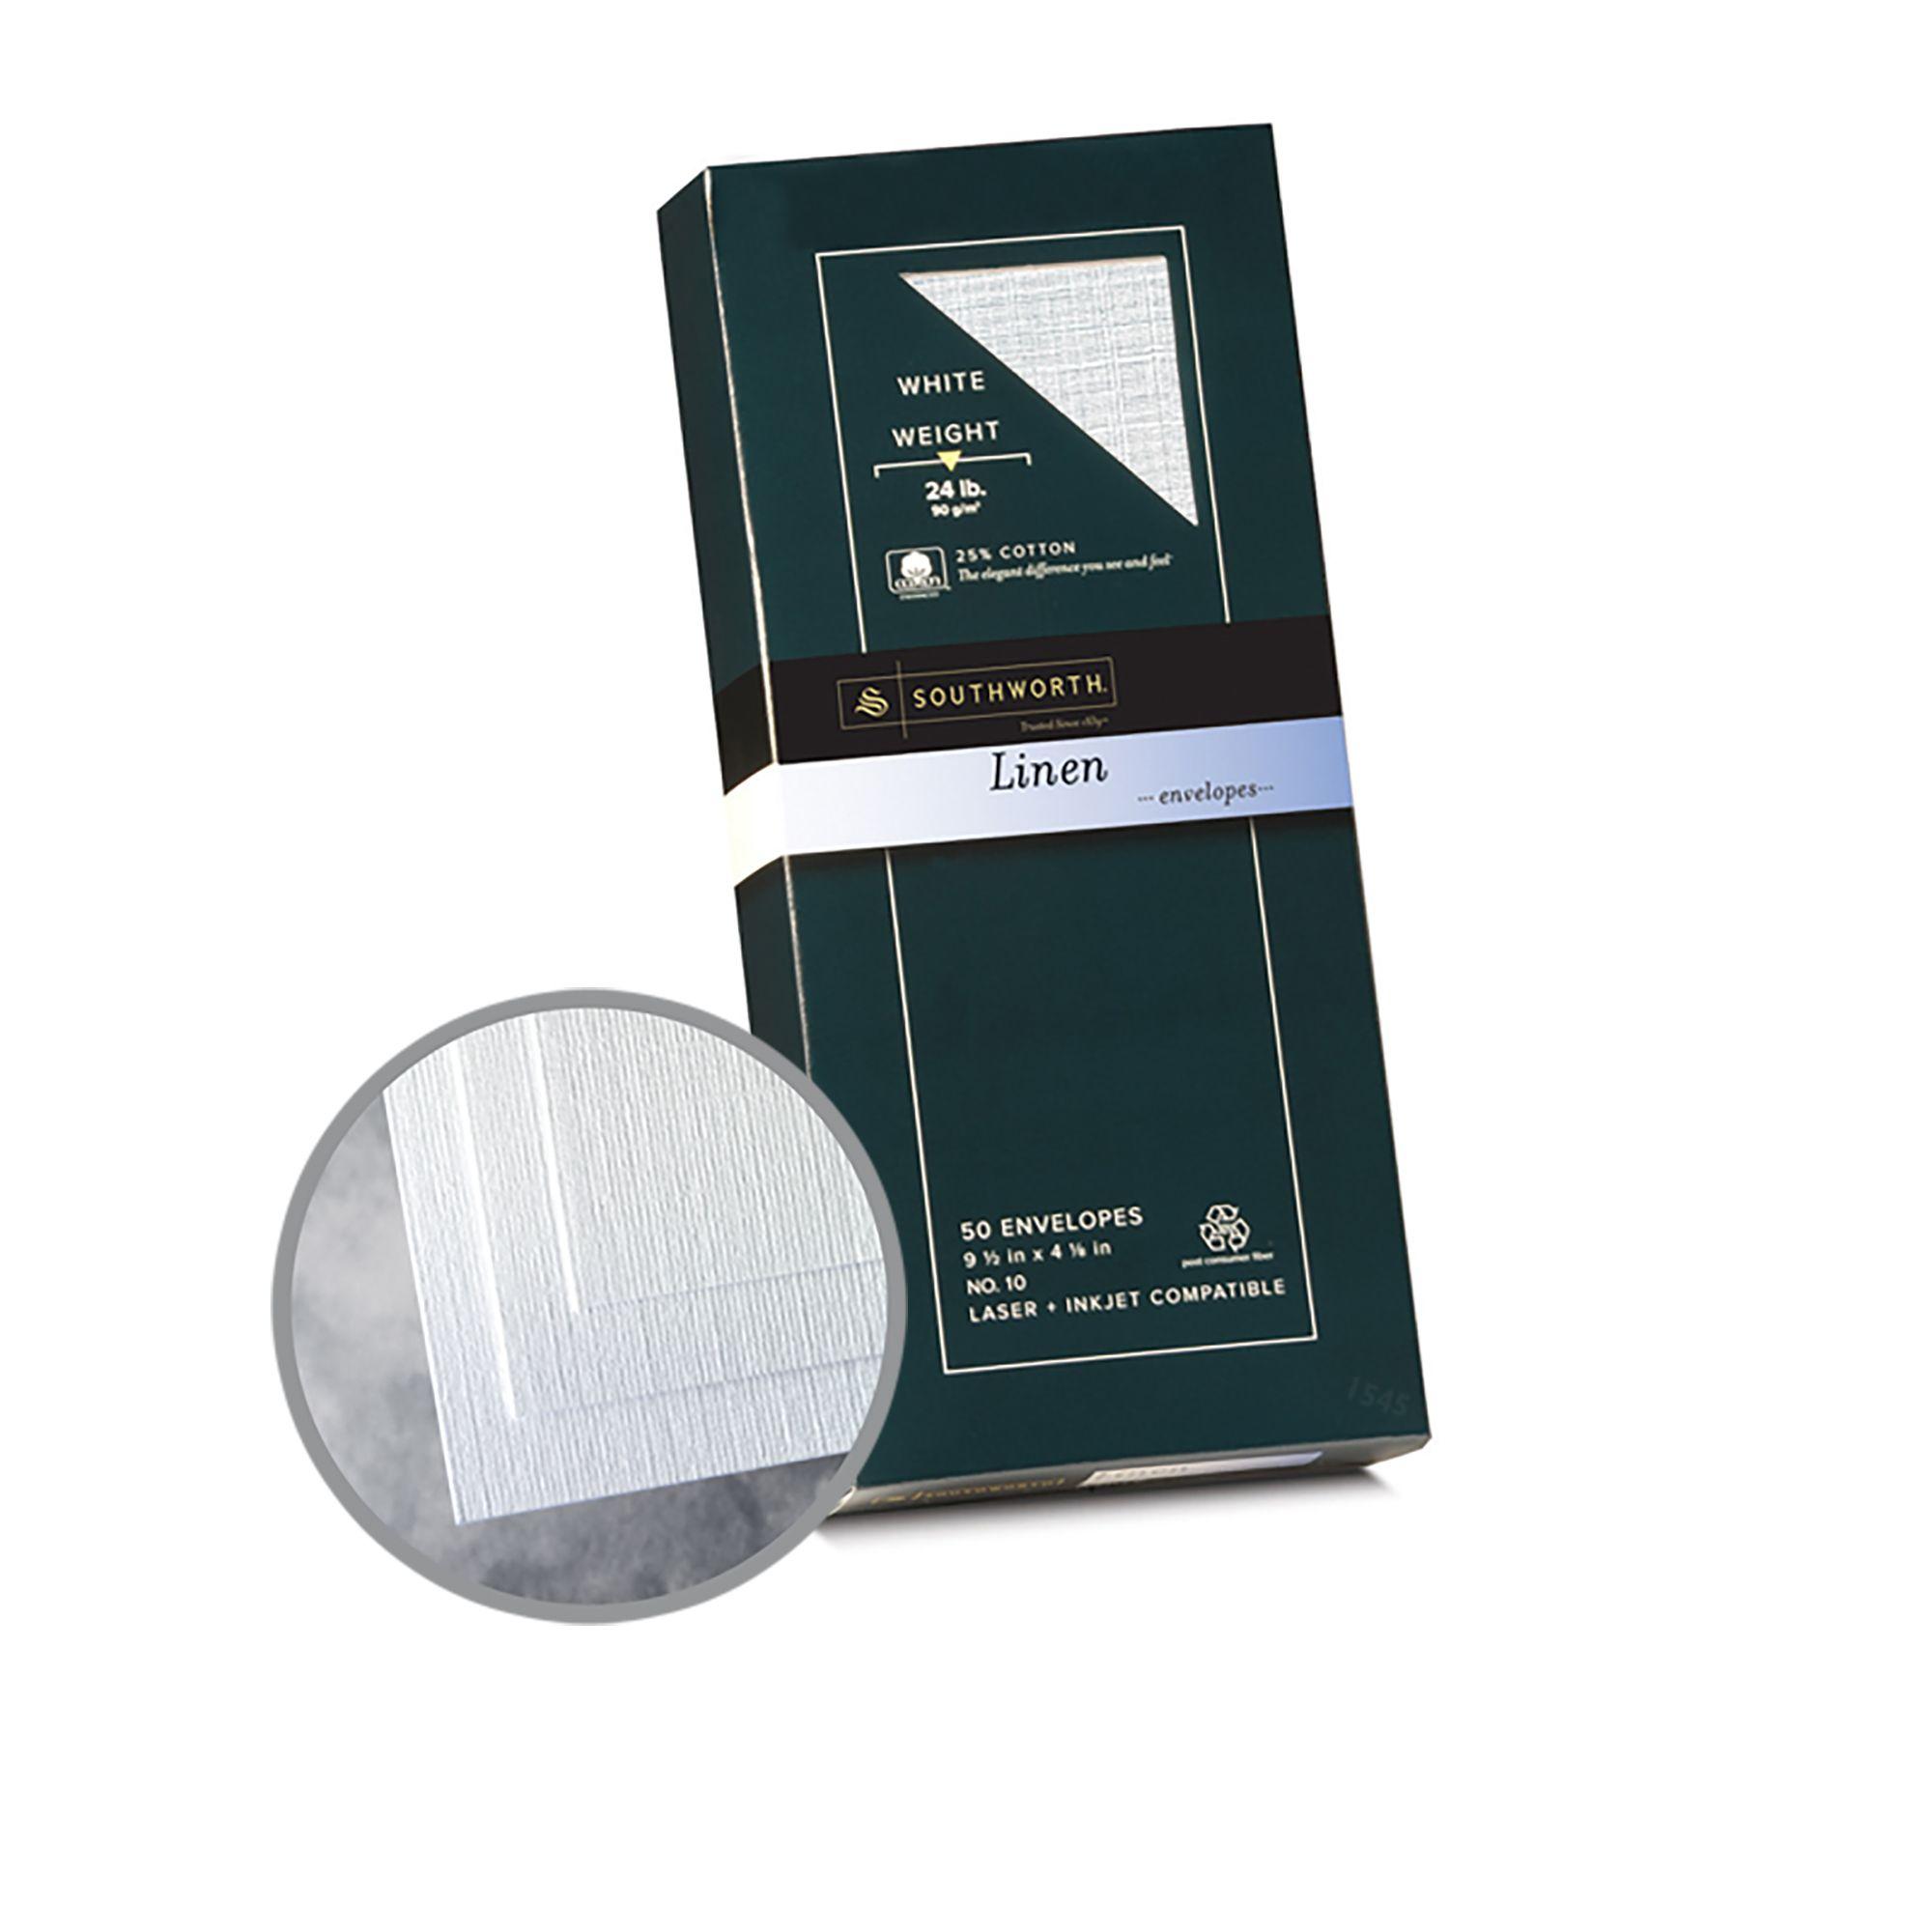 Southworth WHITE Linen Envelopes 24lb 25/% cotton Laser Inkjet compatible NEW!